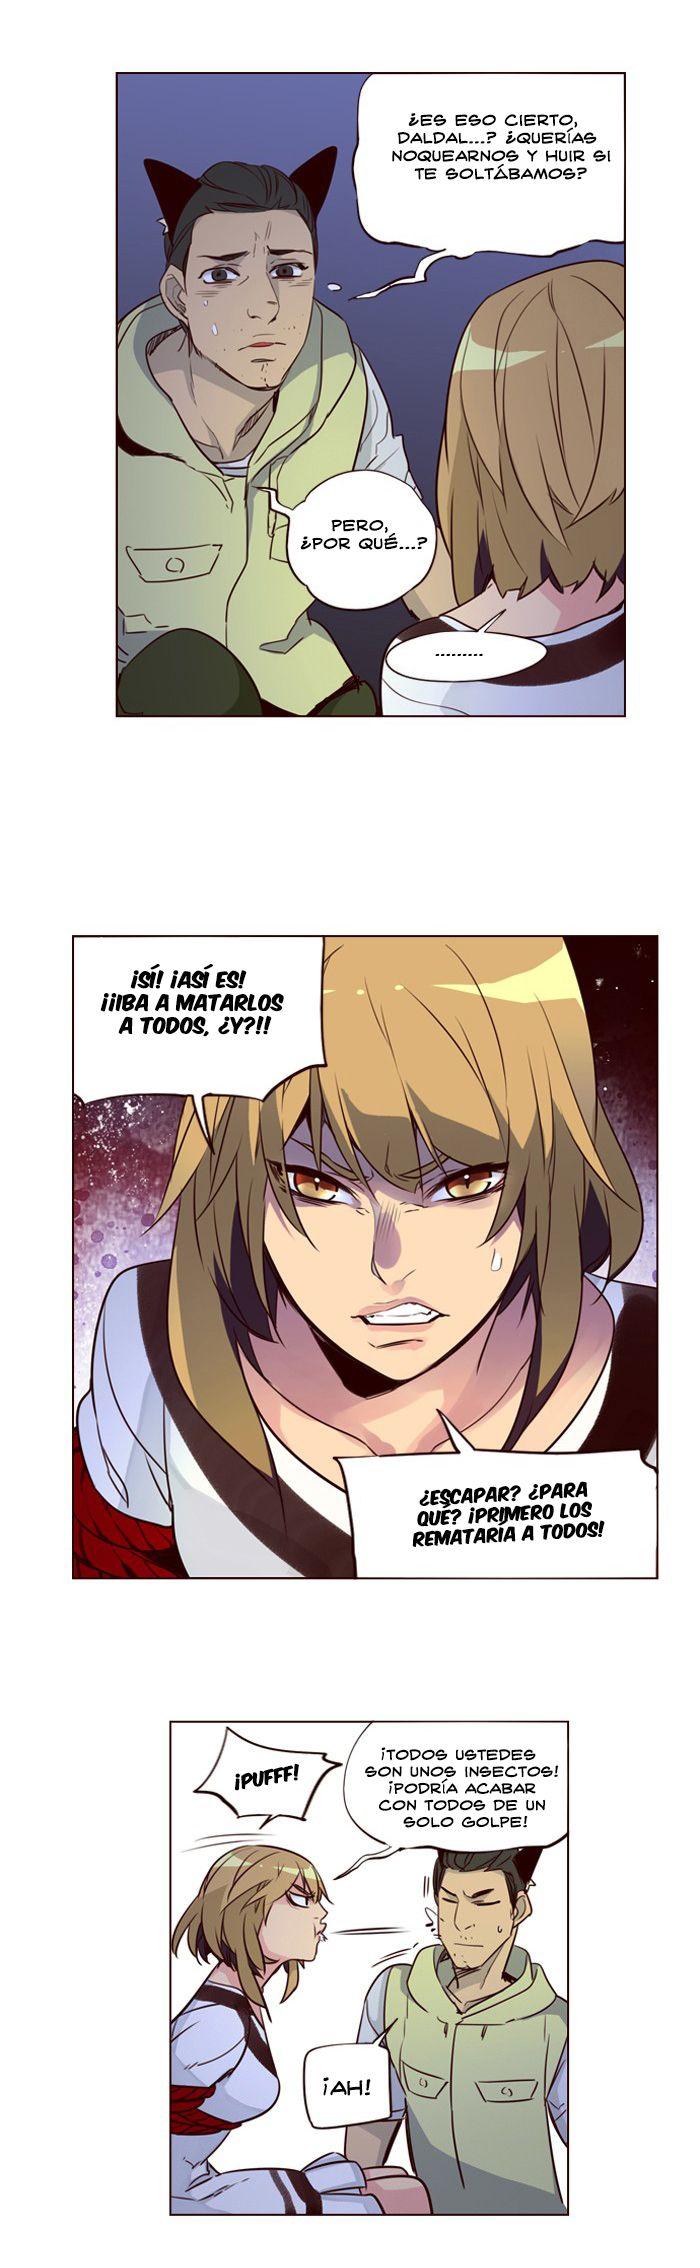 http://c5.ninemanga.com/es_manga/pic2/32/416/515615/fcd11da01e886bc1be35b19f4d974f4e.jpg Page 9